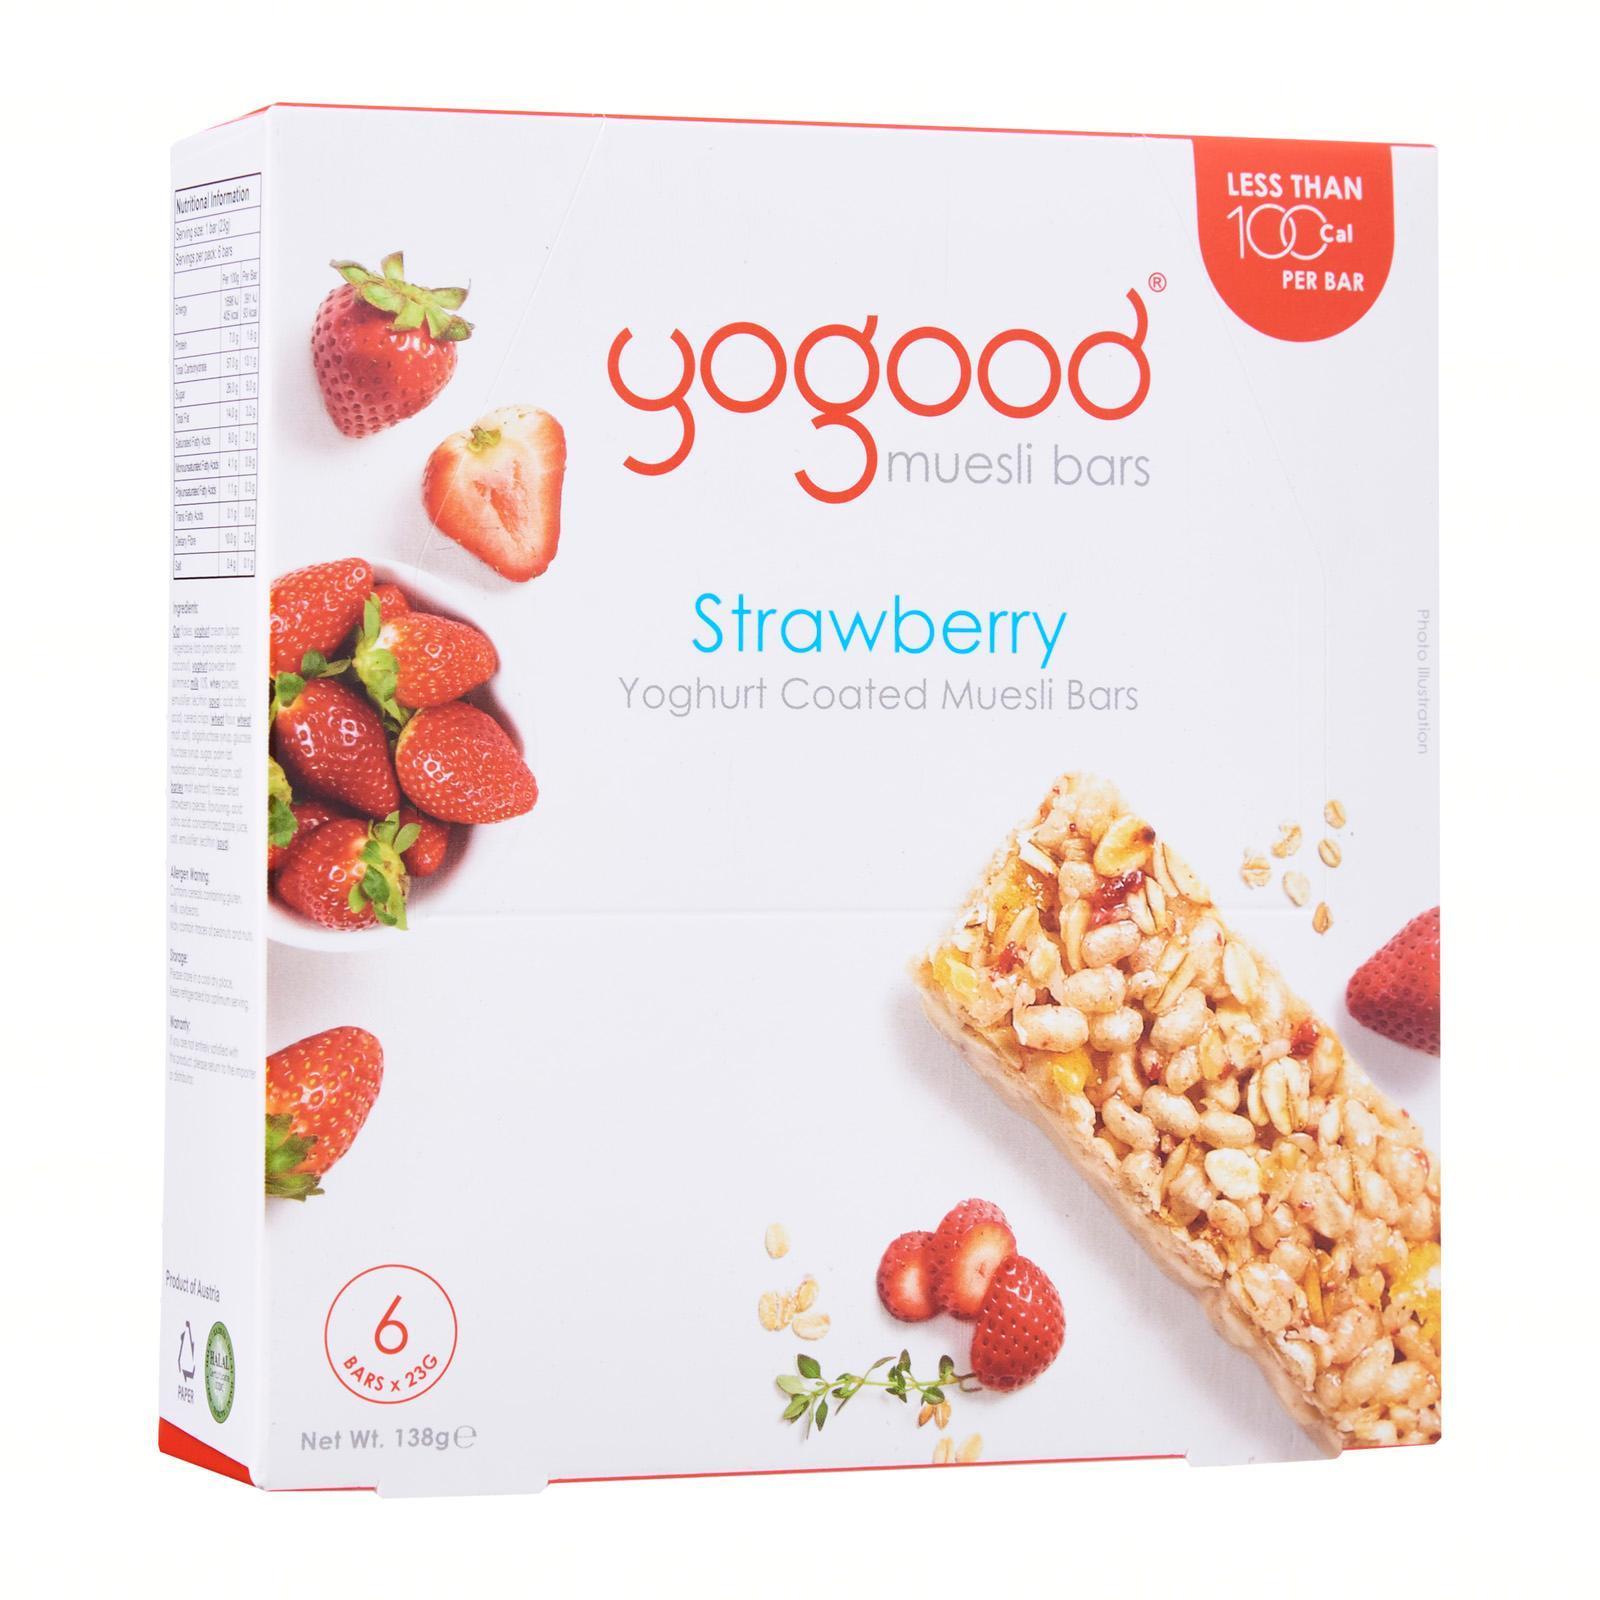 YOGOOD Muesli Bar Yoghurt Coated - Strawberry 23gX6s